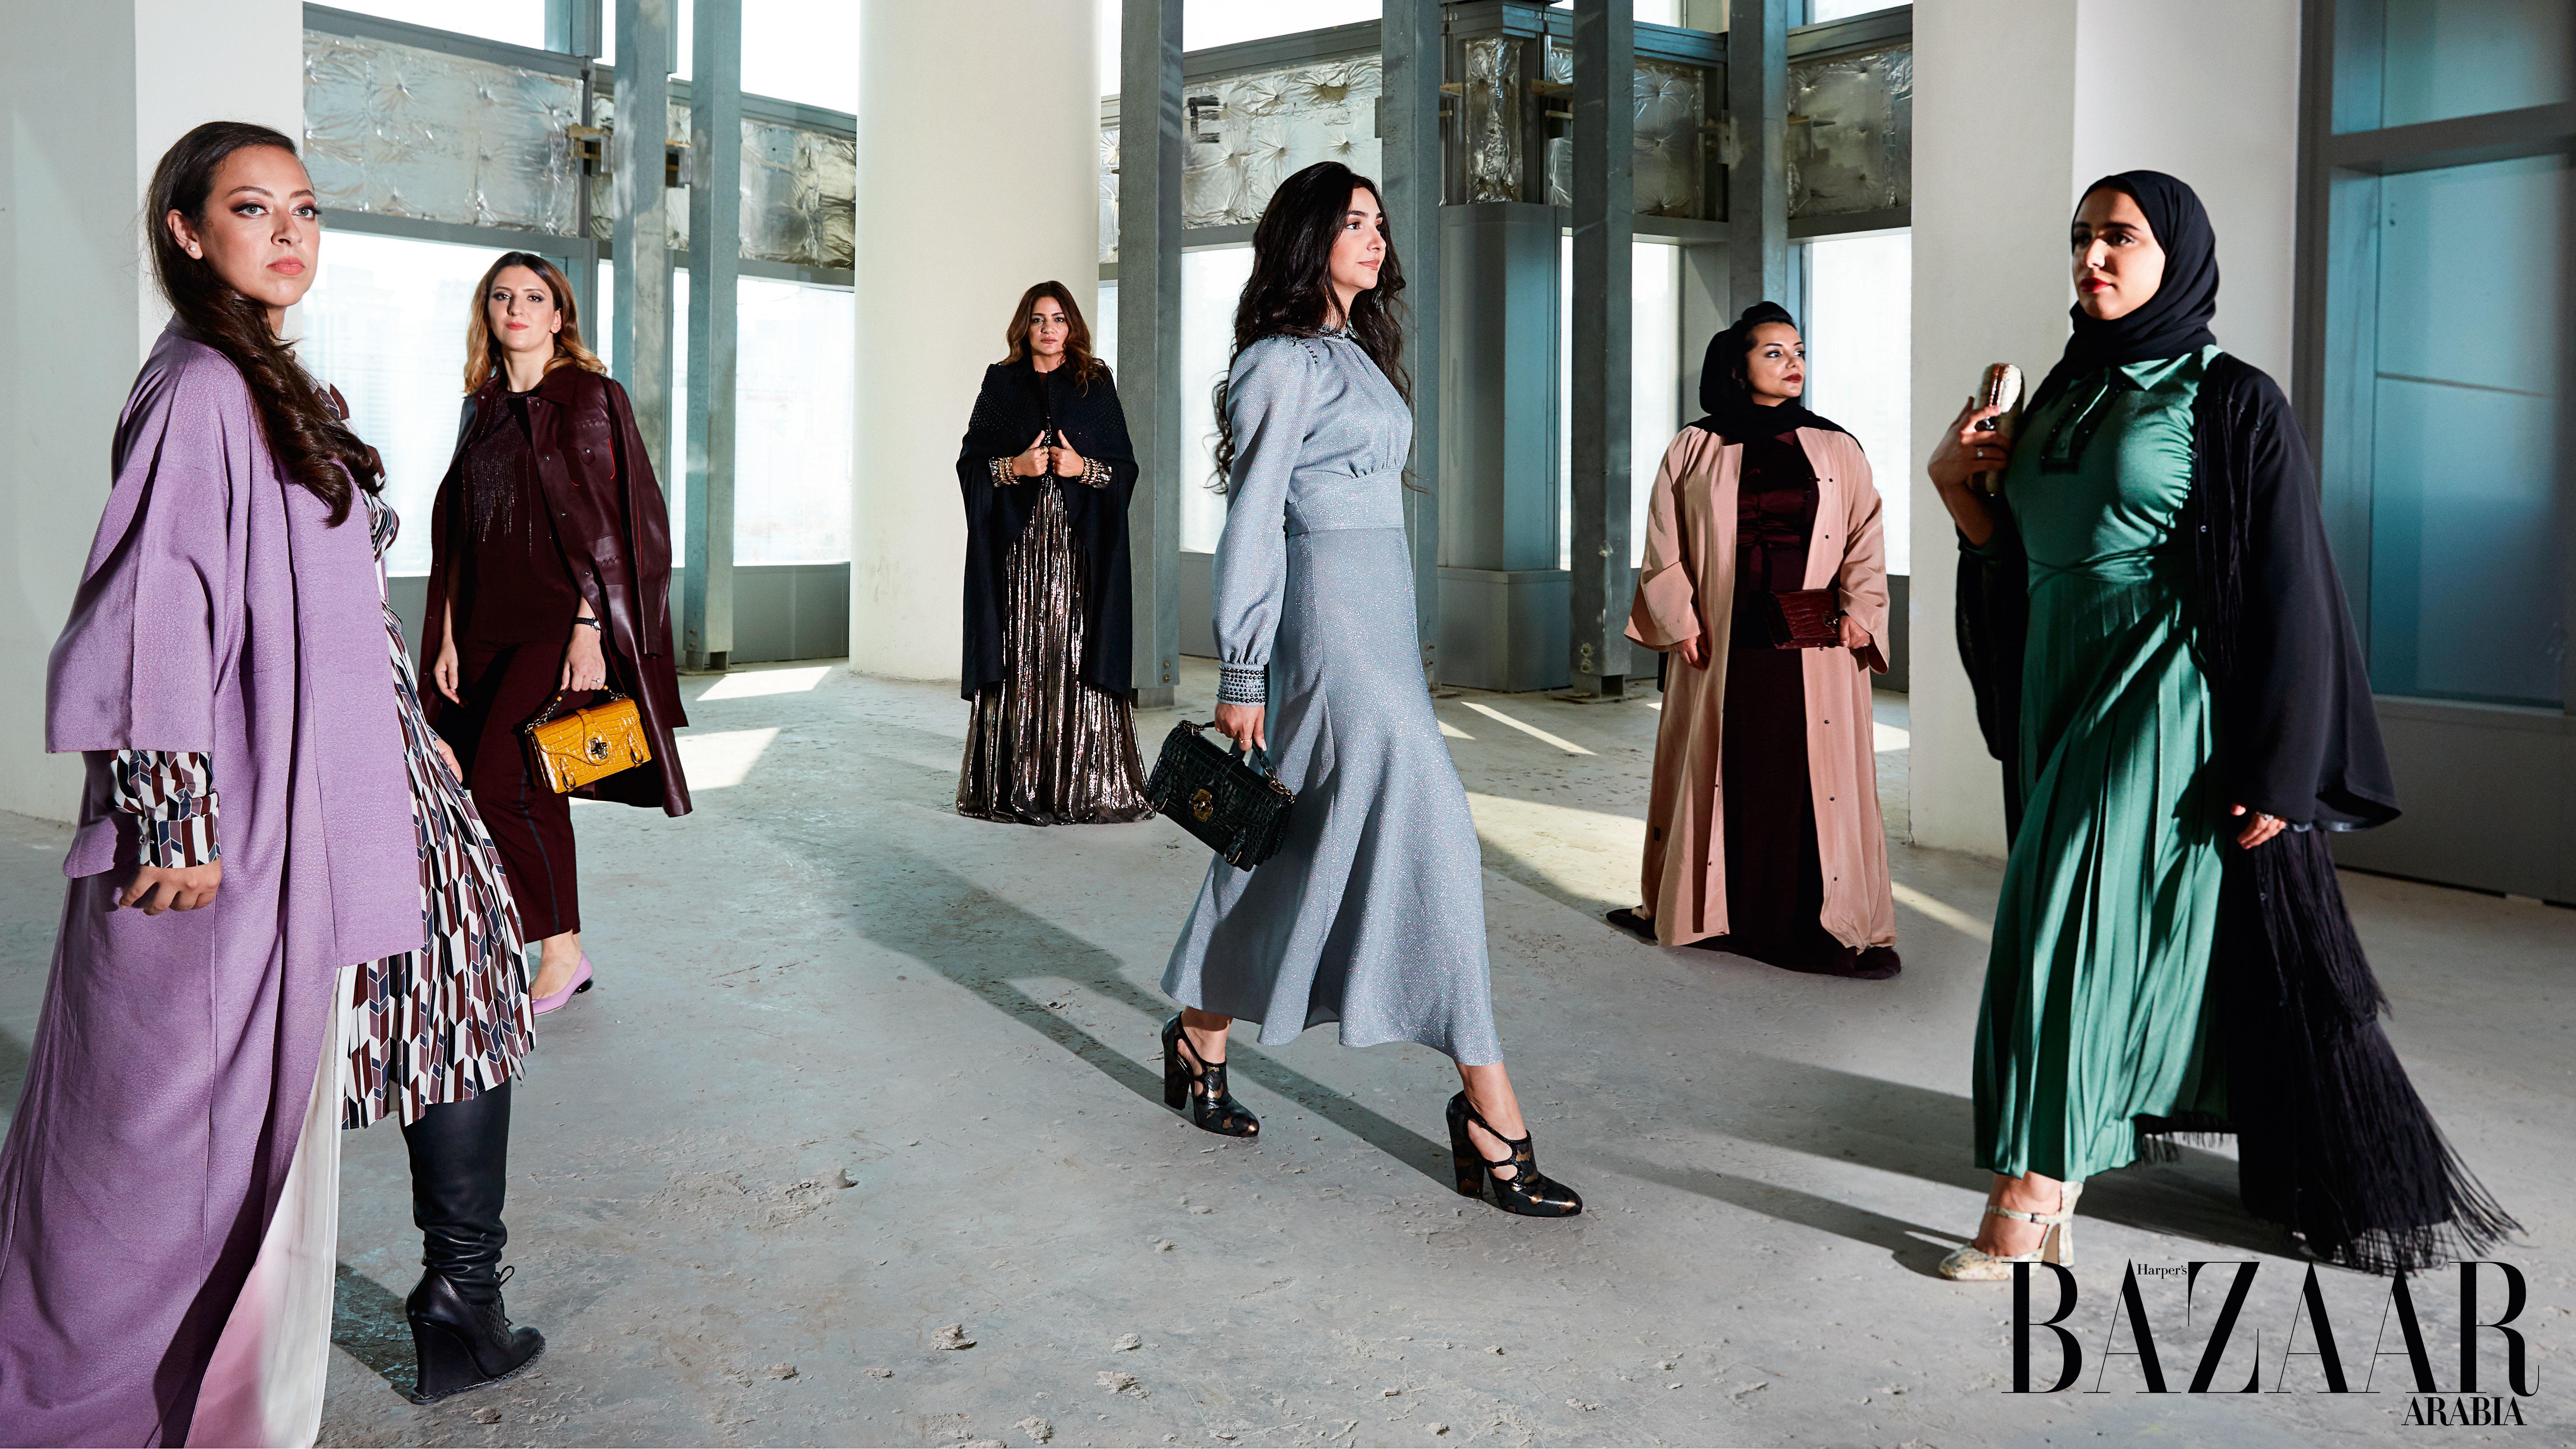 Watch: Bazaar Meets 6 Pioneering Female Film Directors From The Region